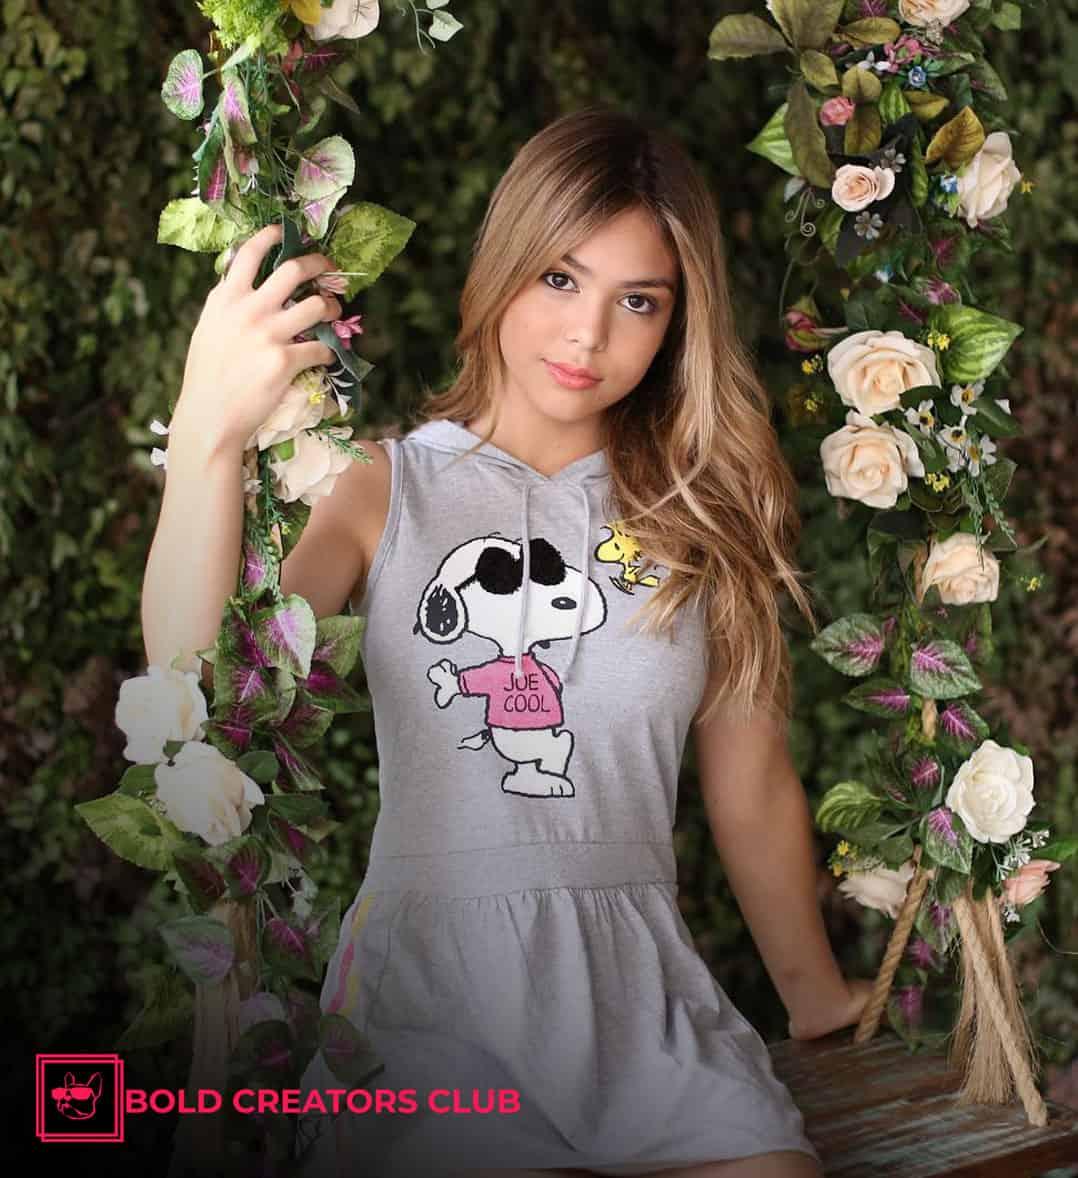 Melody Bold Creators Club Influencer Marketing Agency South America Brazil